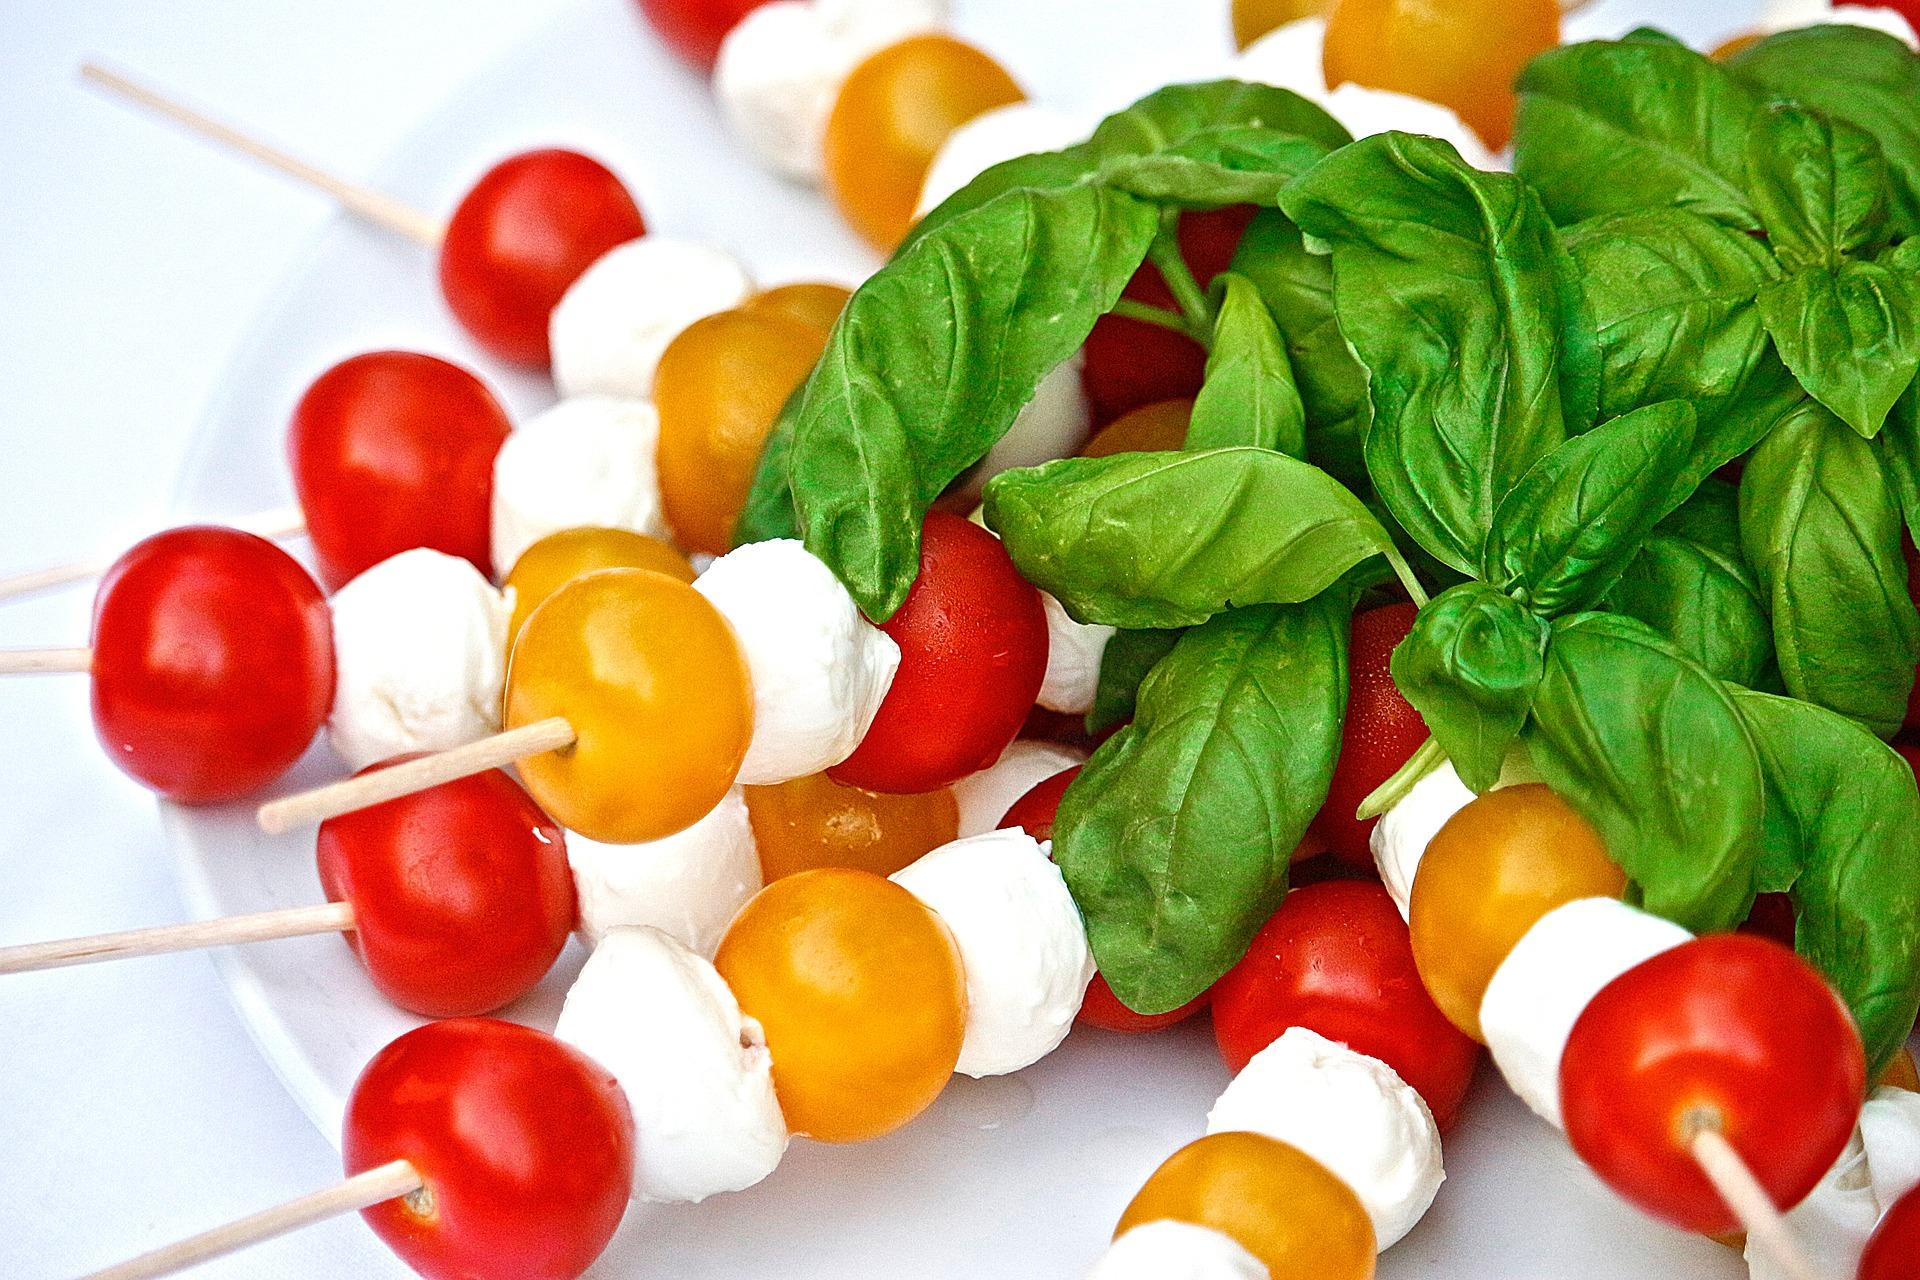 tomatoes-1629186_1920.jpg